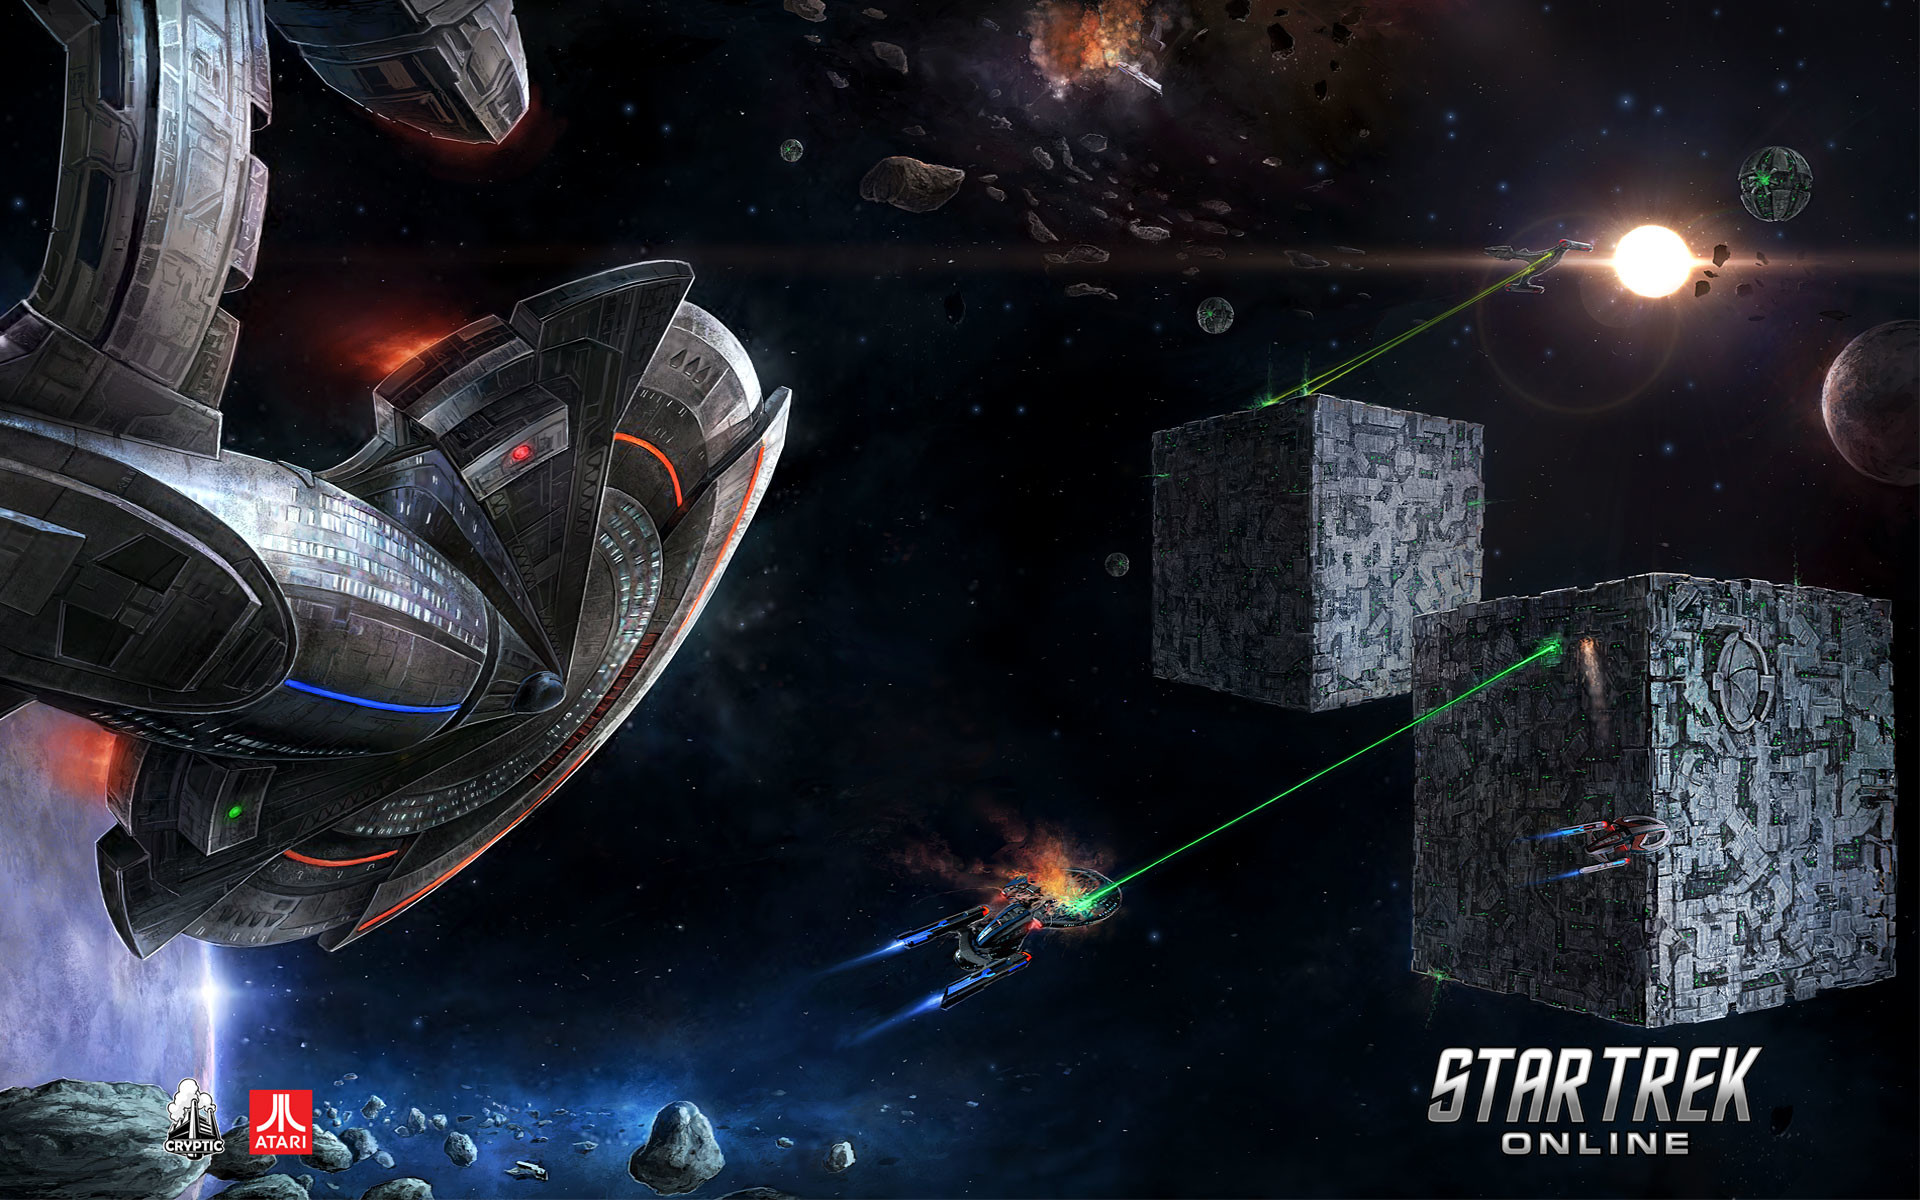 Star Trek Wallpaper | Star Trek Online Wallpapers